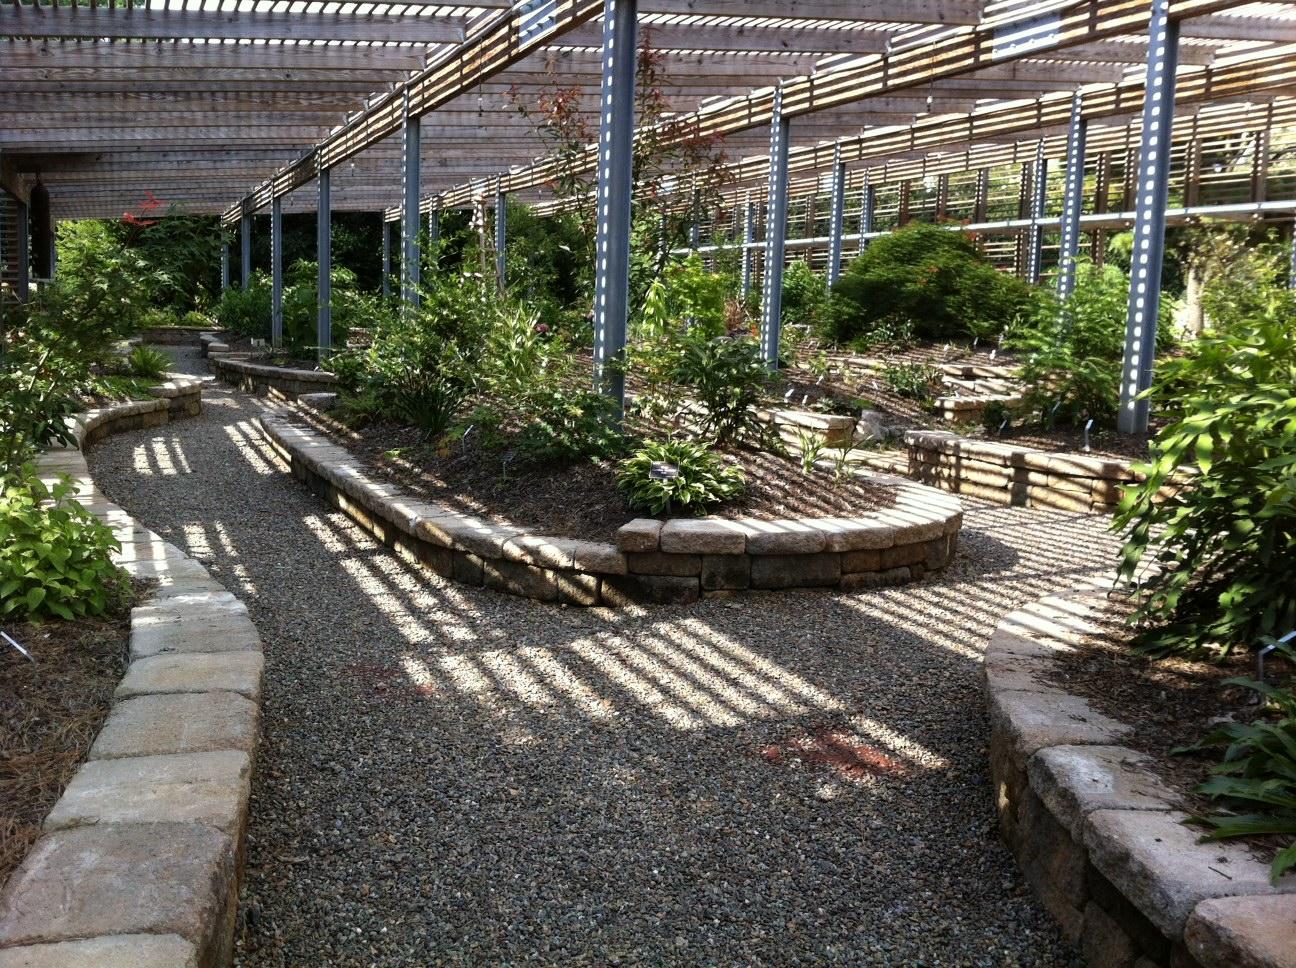 Gr Roots Revival: JCRA Master Plan | Hort Science News on hvac house plans, hampton house plans, garden house plans,